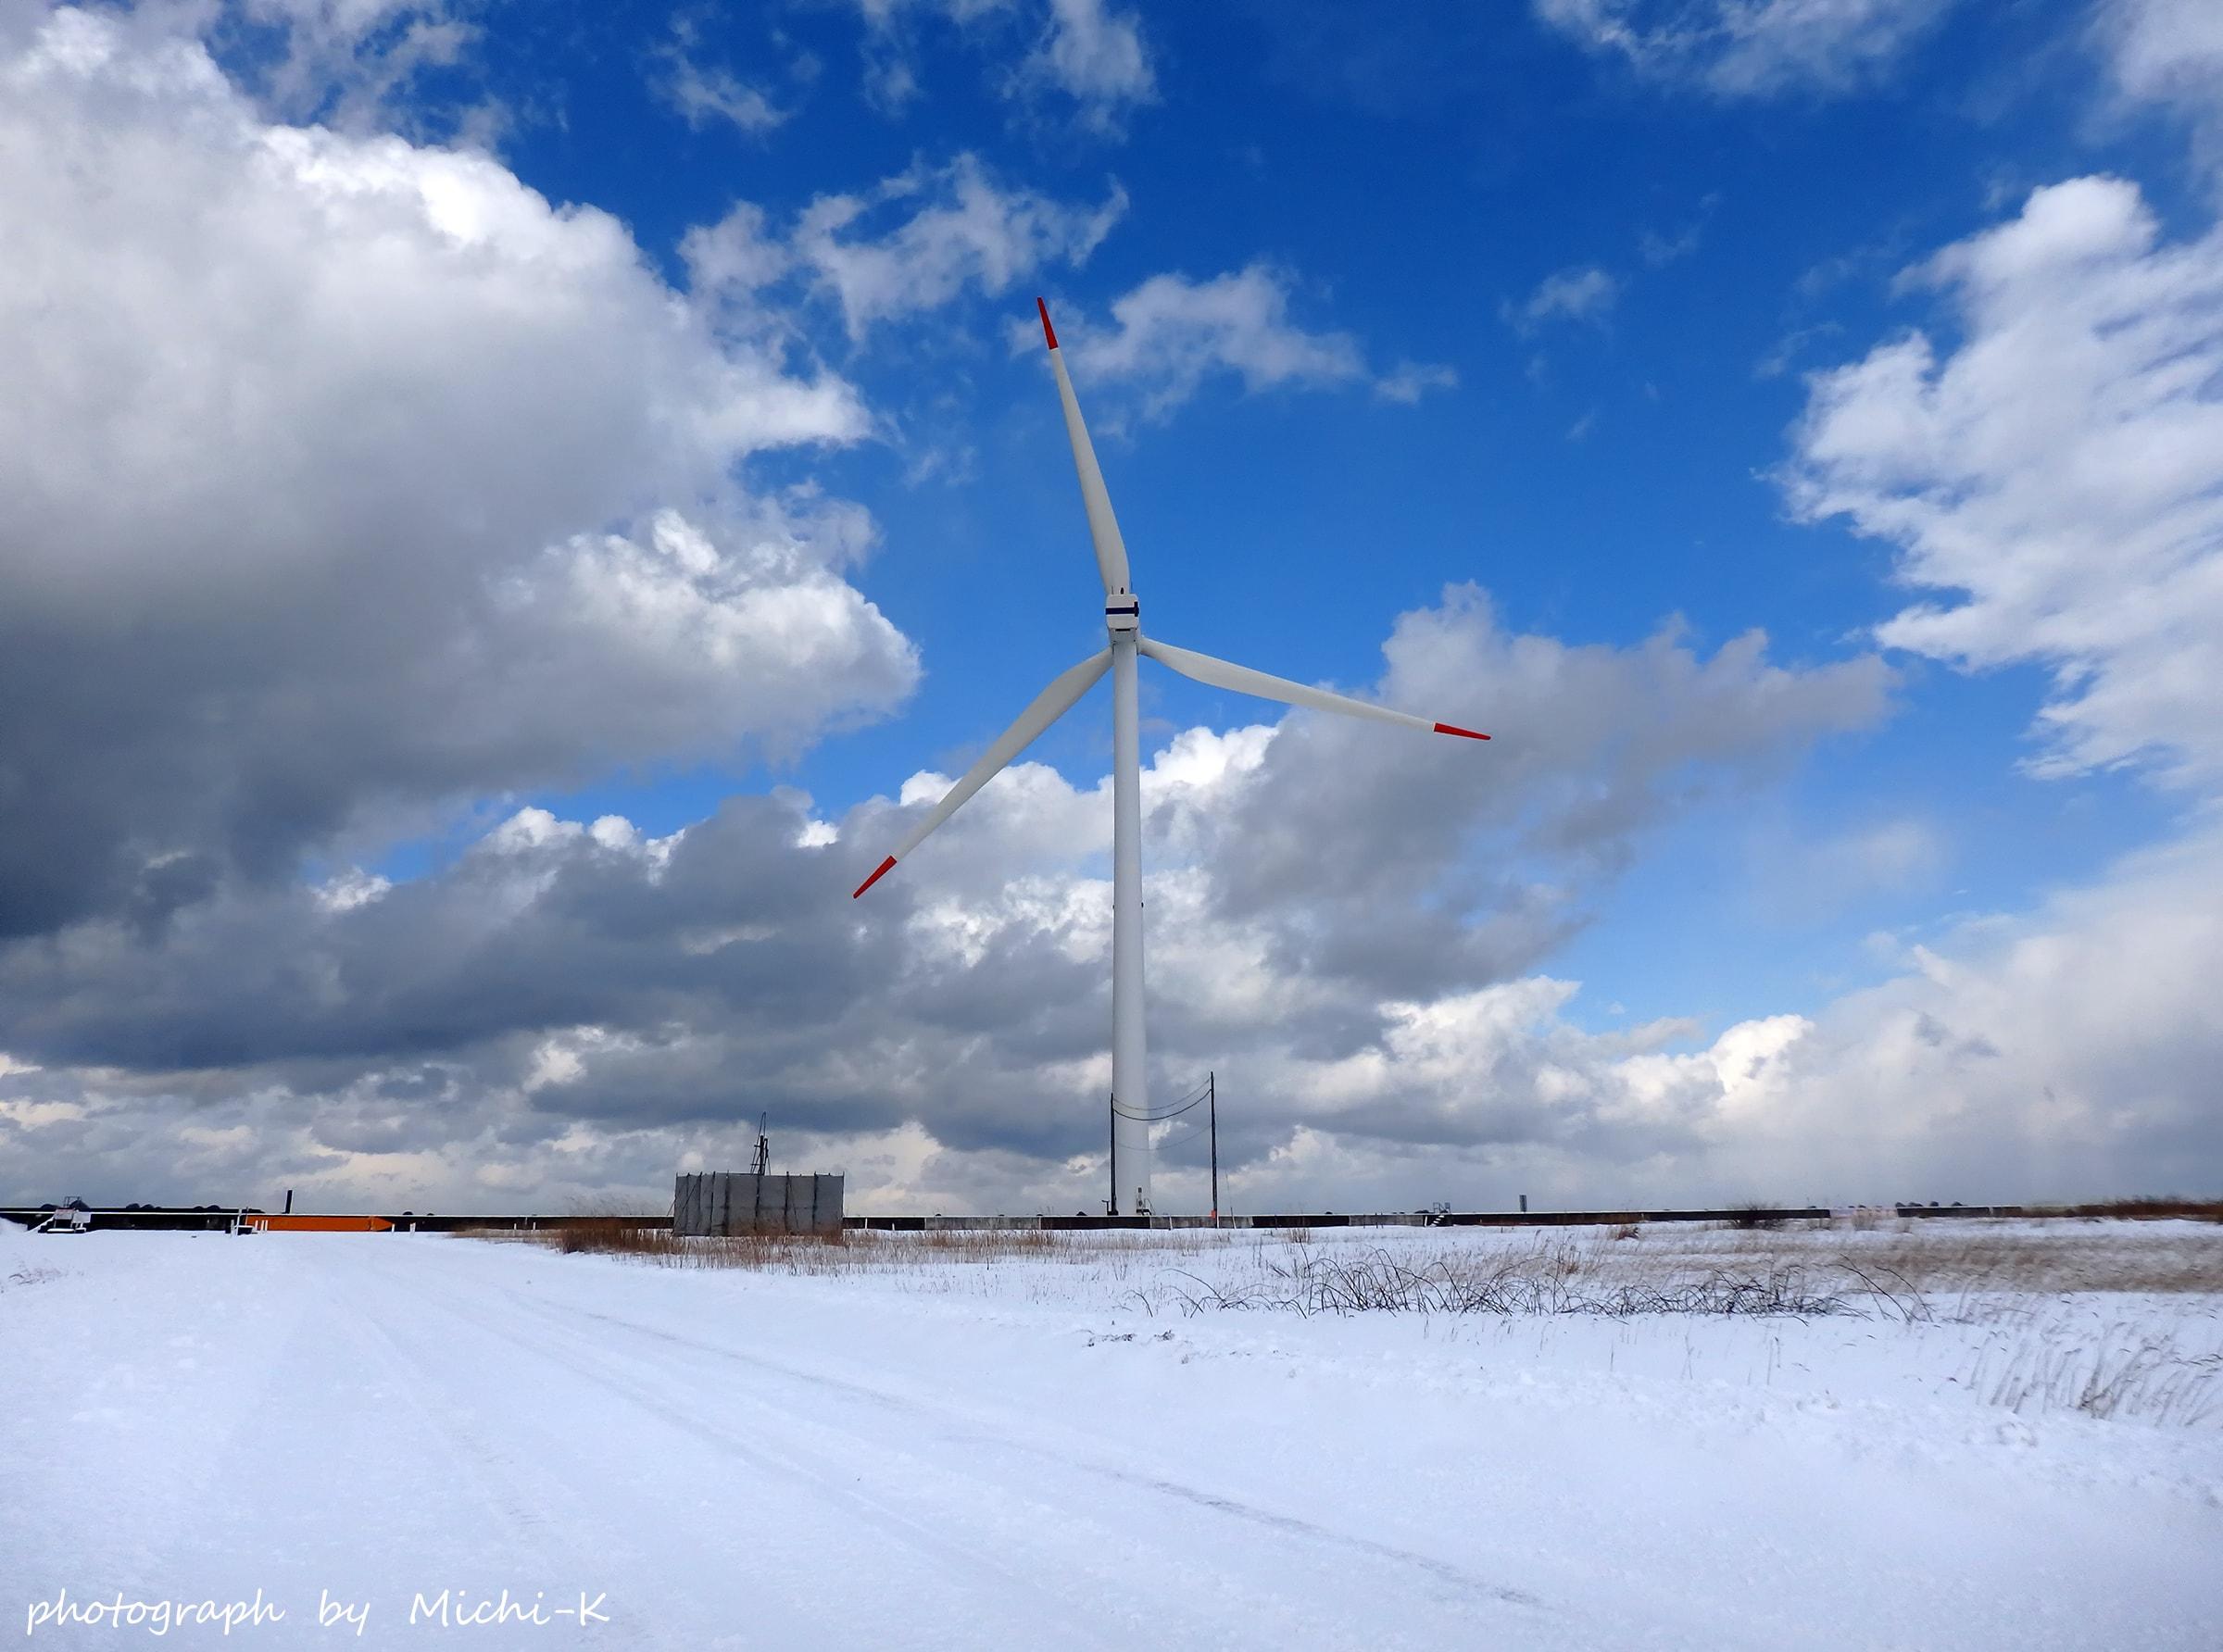 2017年1月15日・酒田北港の風車-3